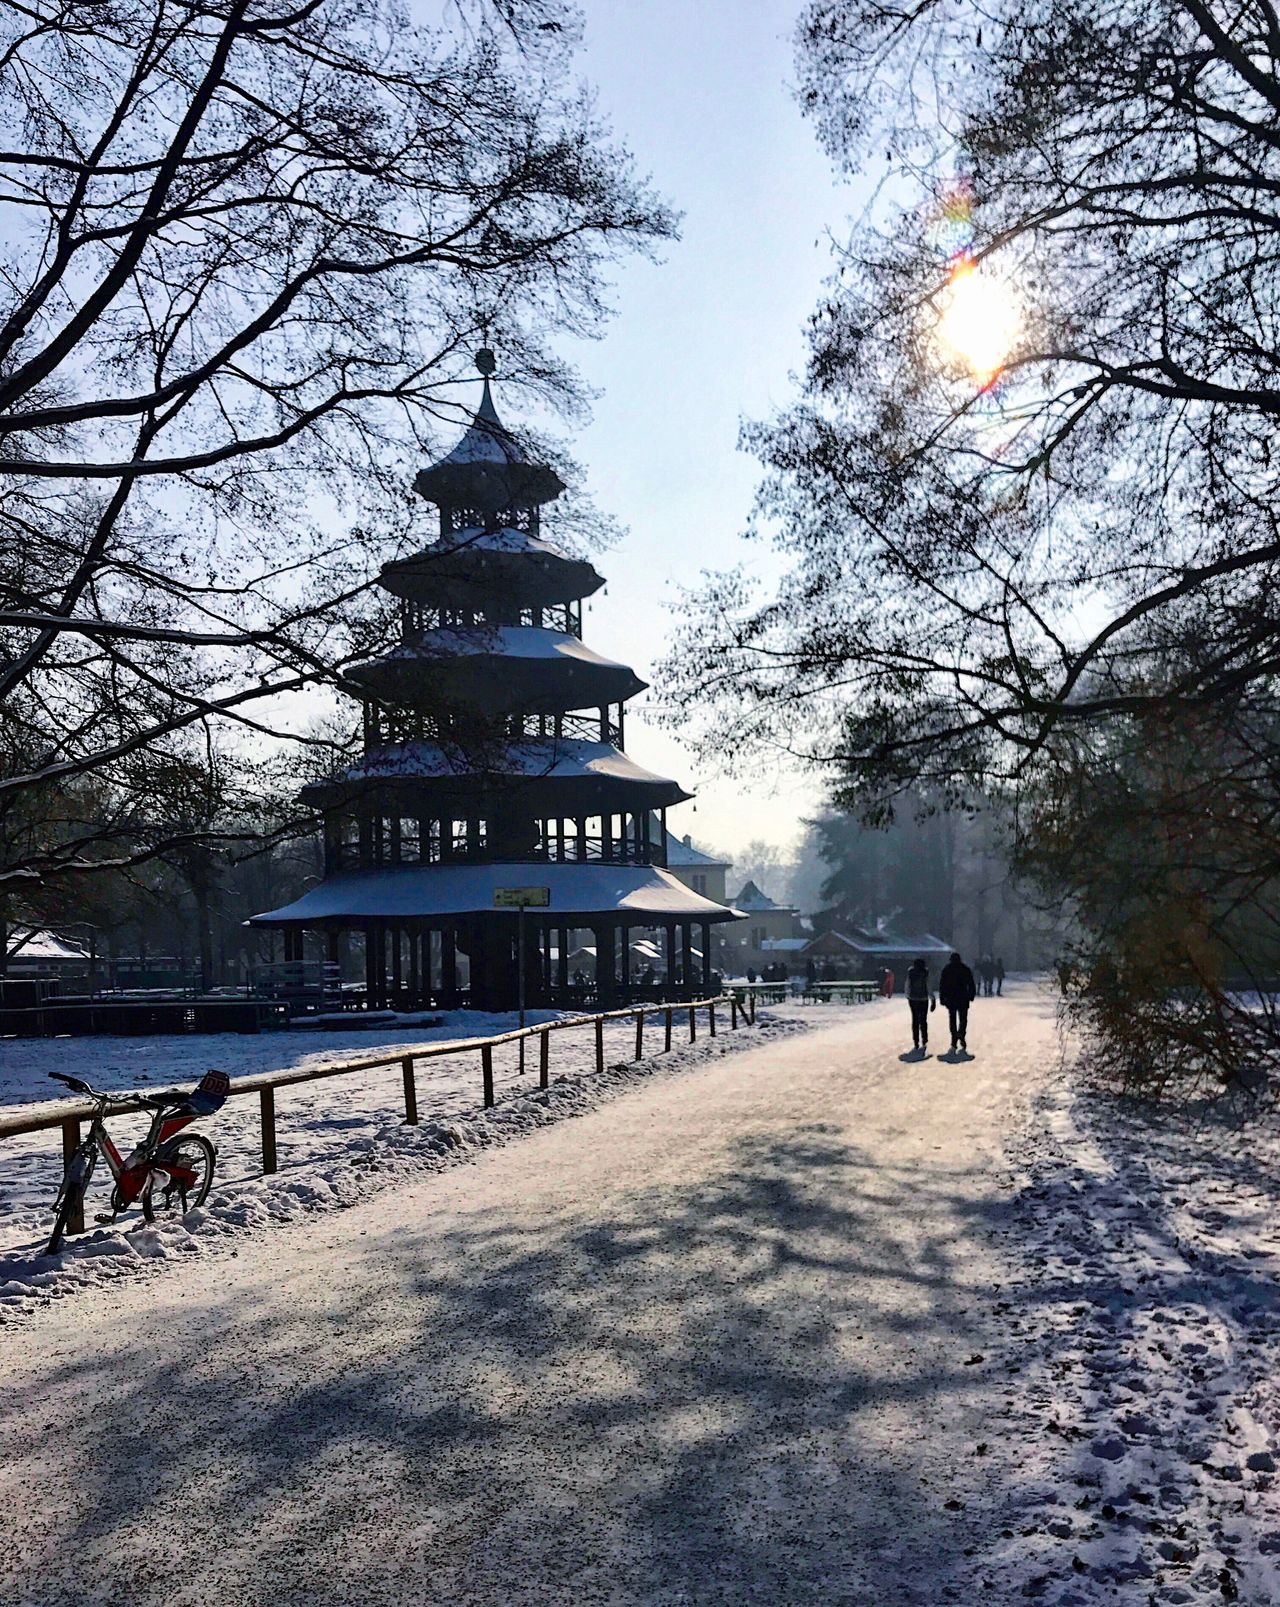 Englisch Garten Winter Snow Garden Park Munich Bavaria Germany Neighborhood Map